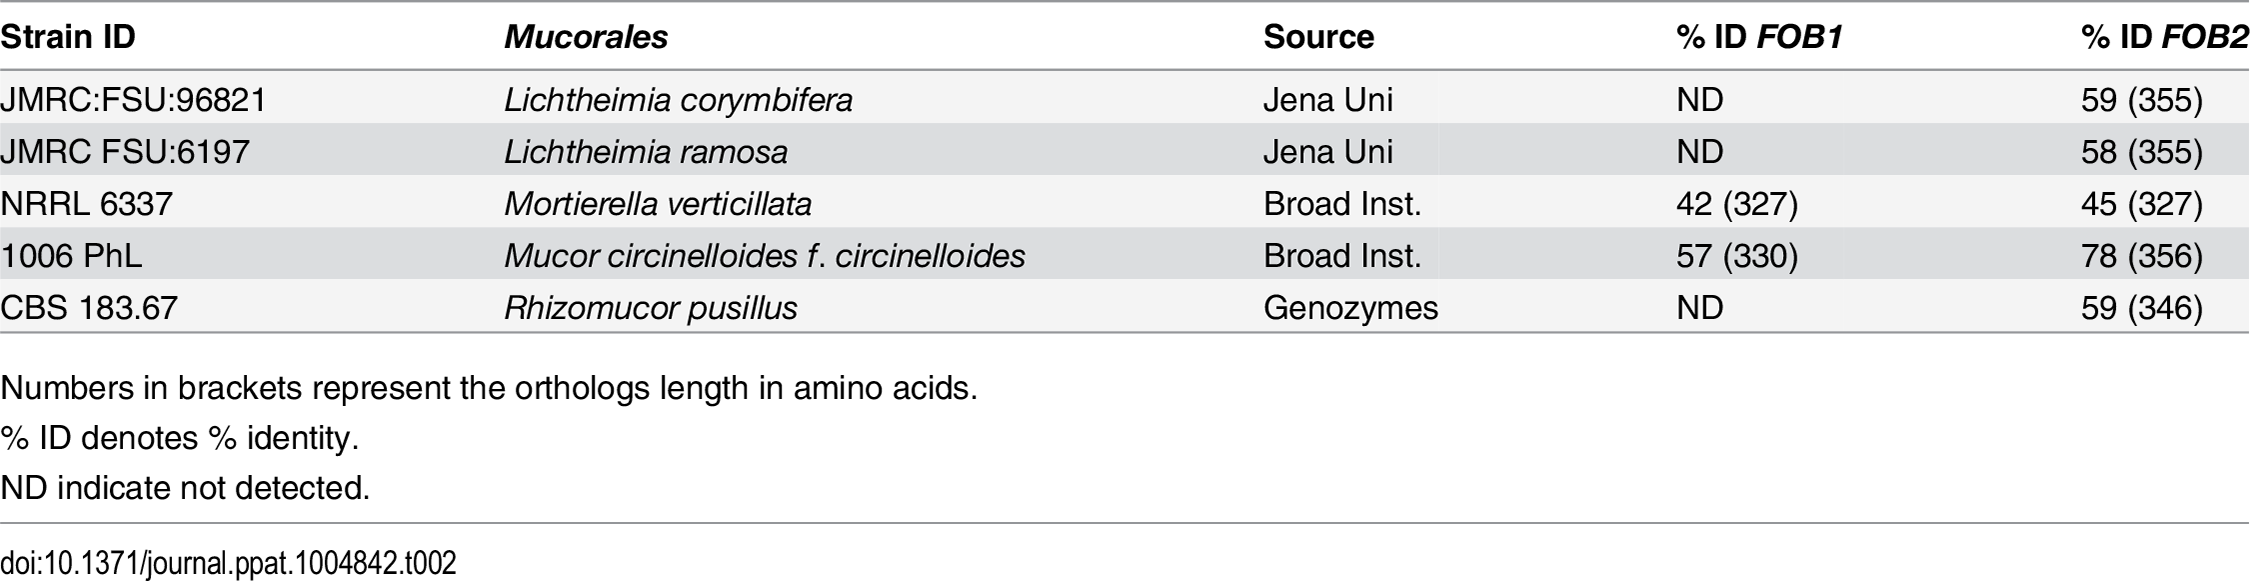 Sequence homology of <i>FOB1/2</i> genes from <i>R</i>. <i>oryzae</i> 99-880 to possible <i>Mucorales</i> orthologs.